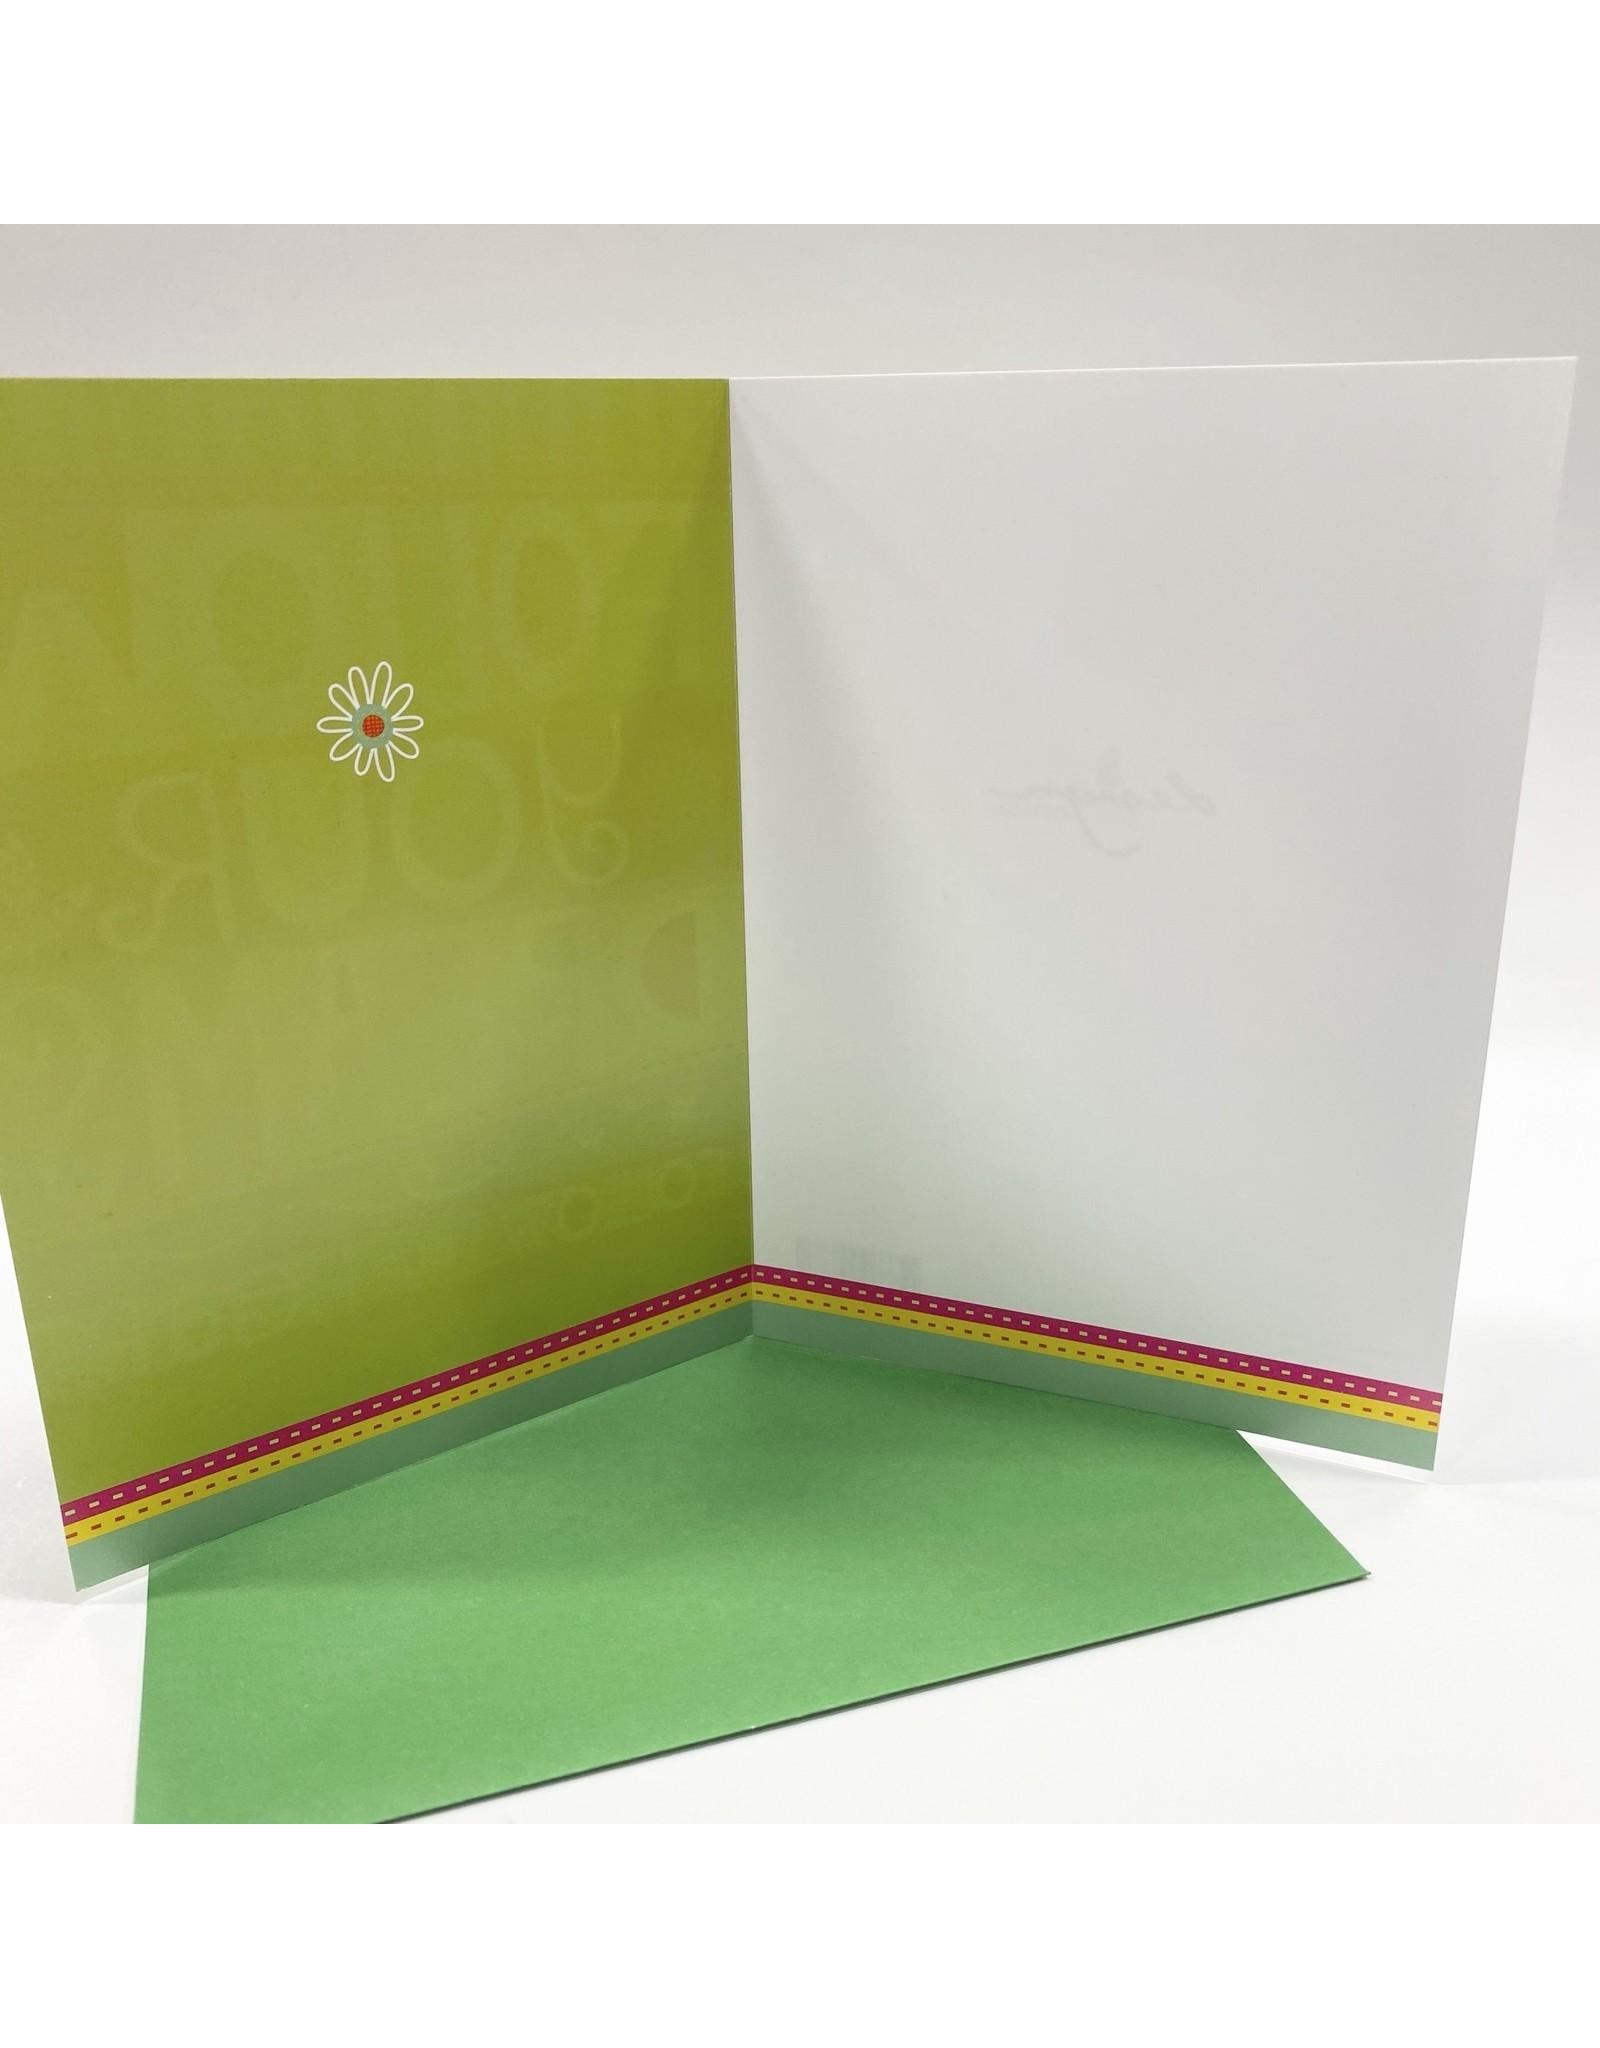 Design Design Greeting Card - Encouragement / Blank